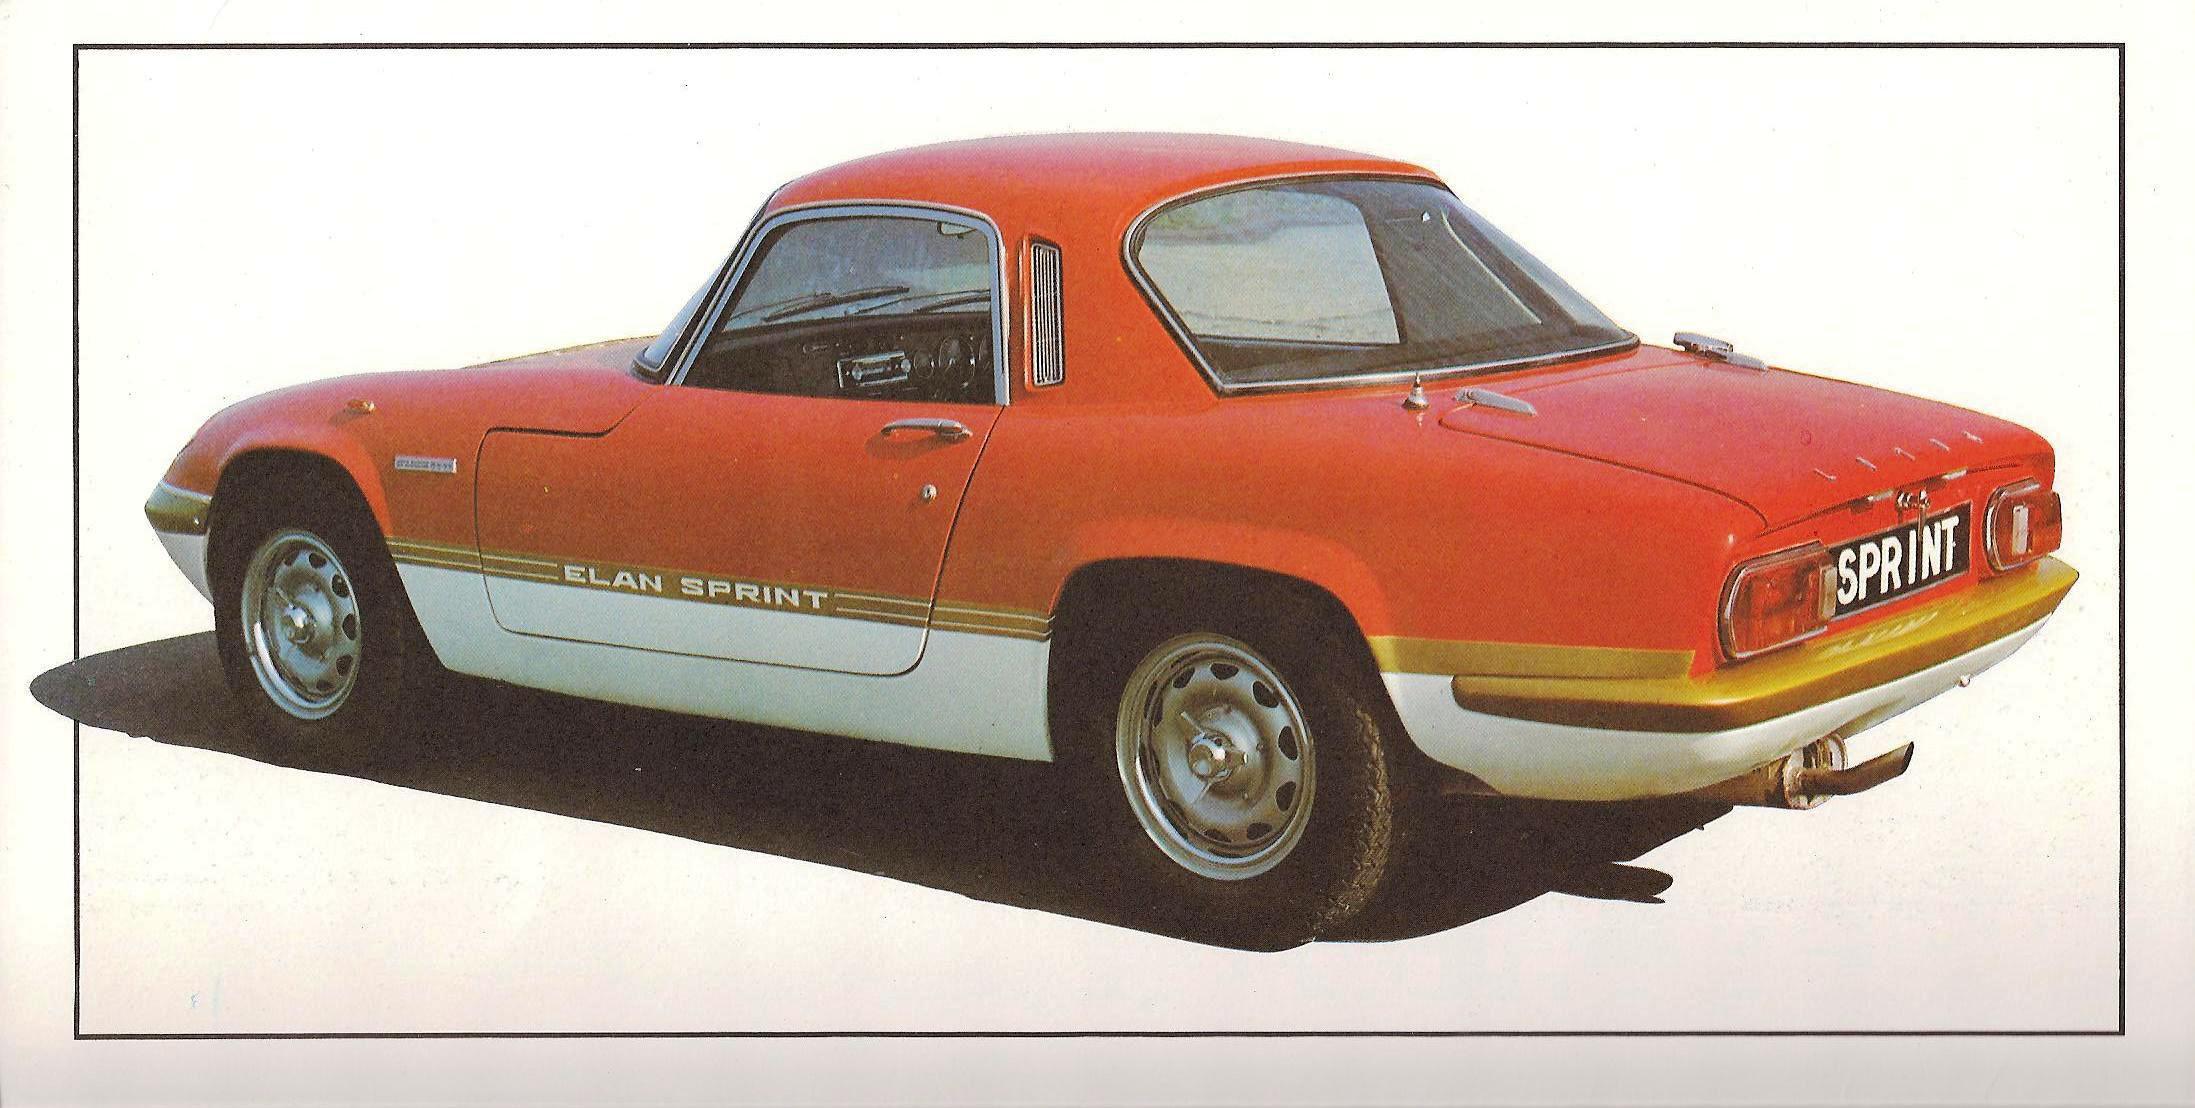 1971 Lotus Elan Sprint Brochure